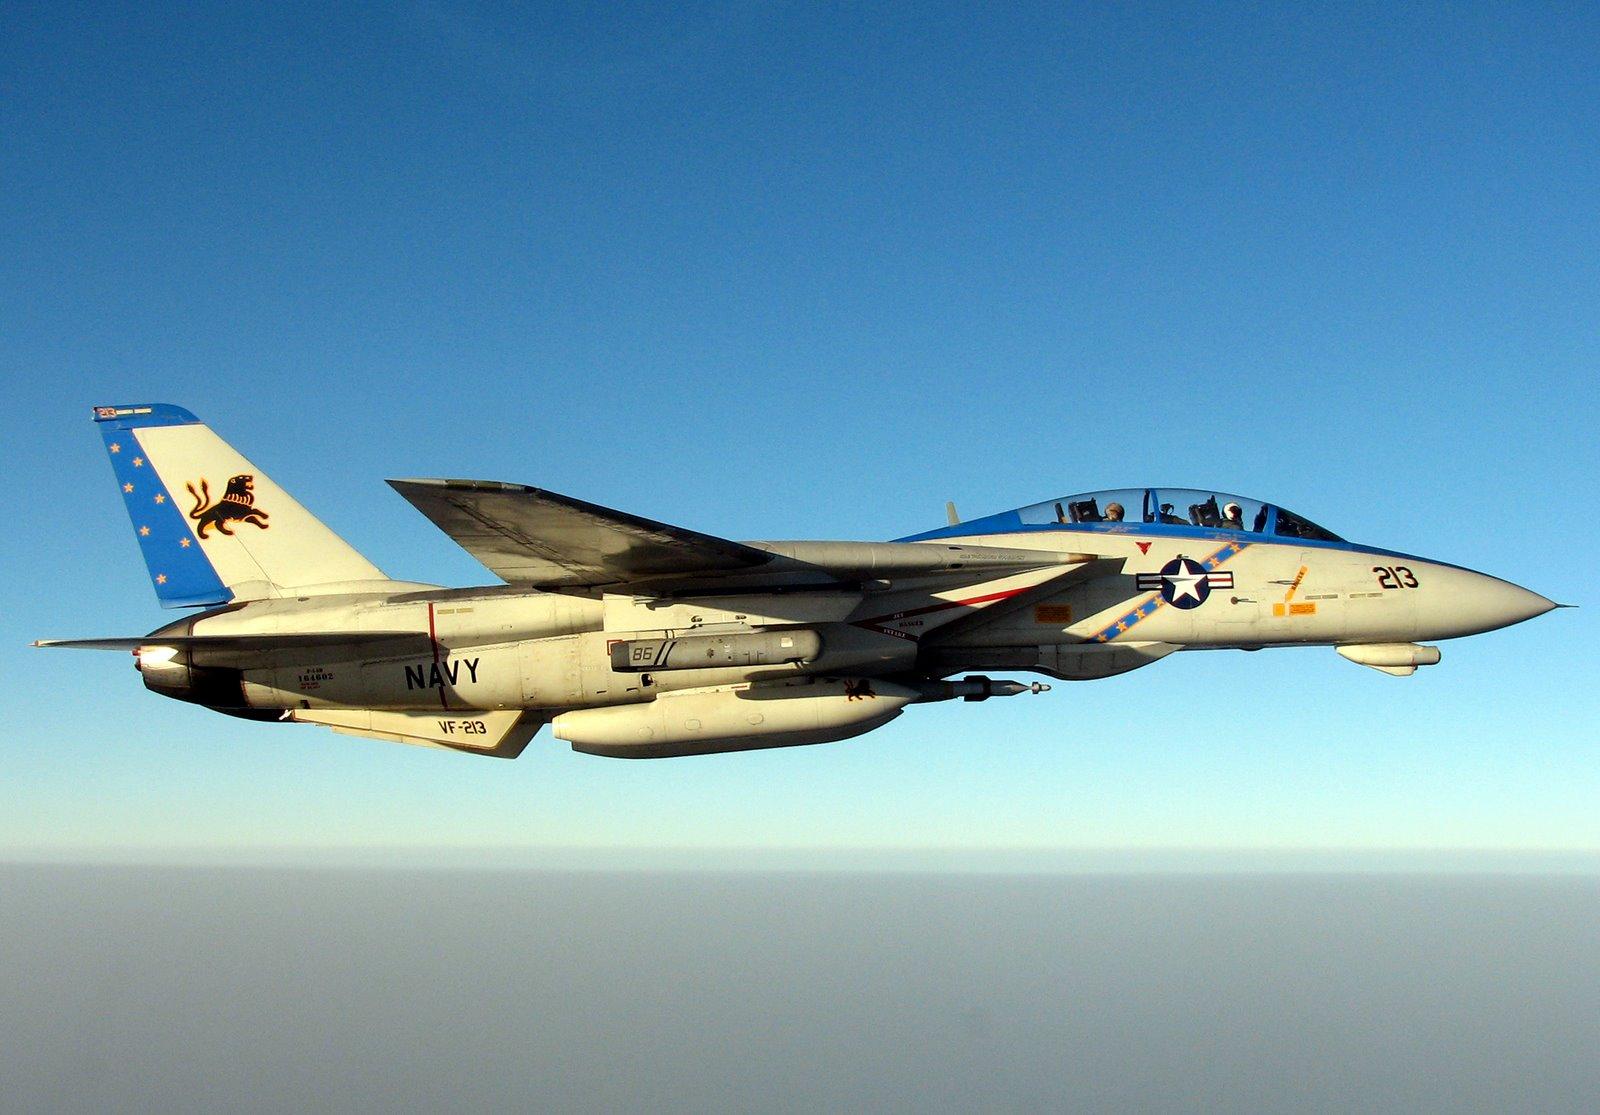 F-14 Tomcat - Page 2 Vf-21310